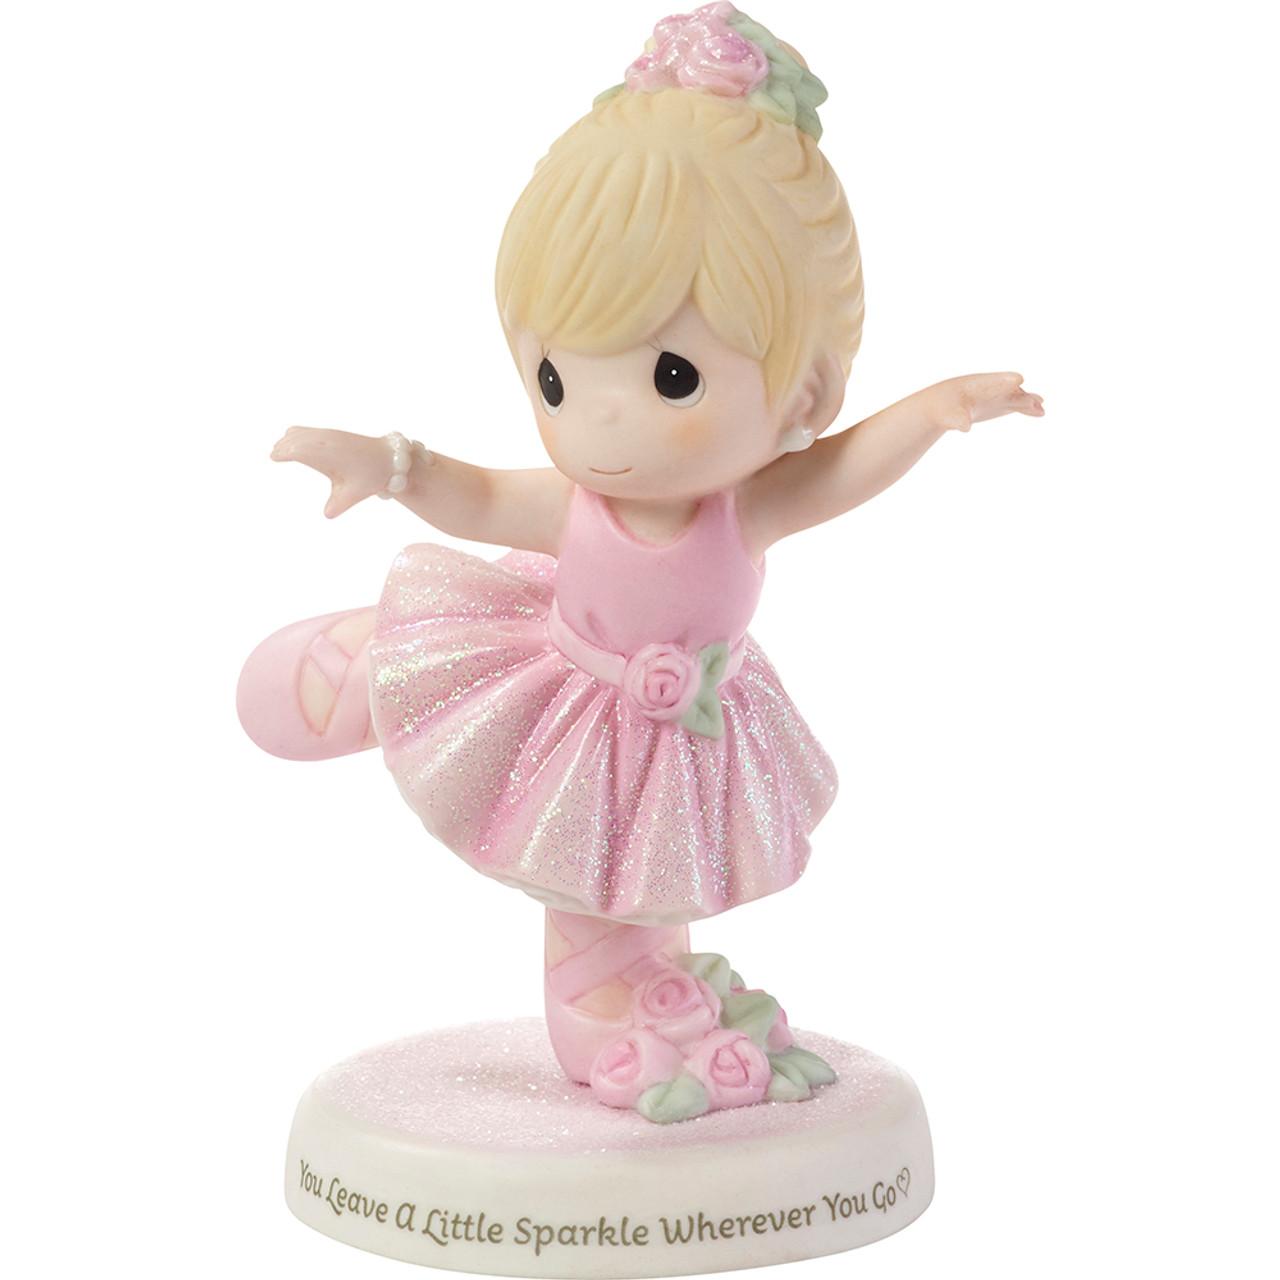 Precious Moments You Leave A Little Sparkle Wherever You Go Ballerina Figurine